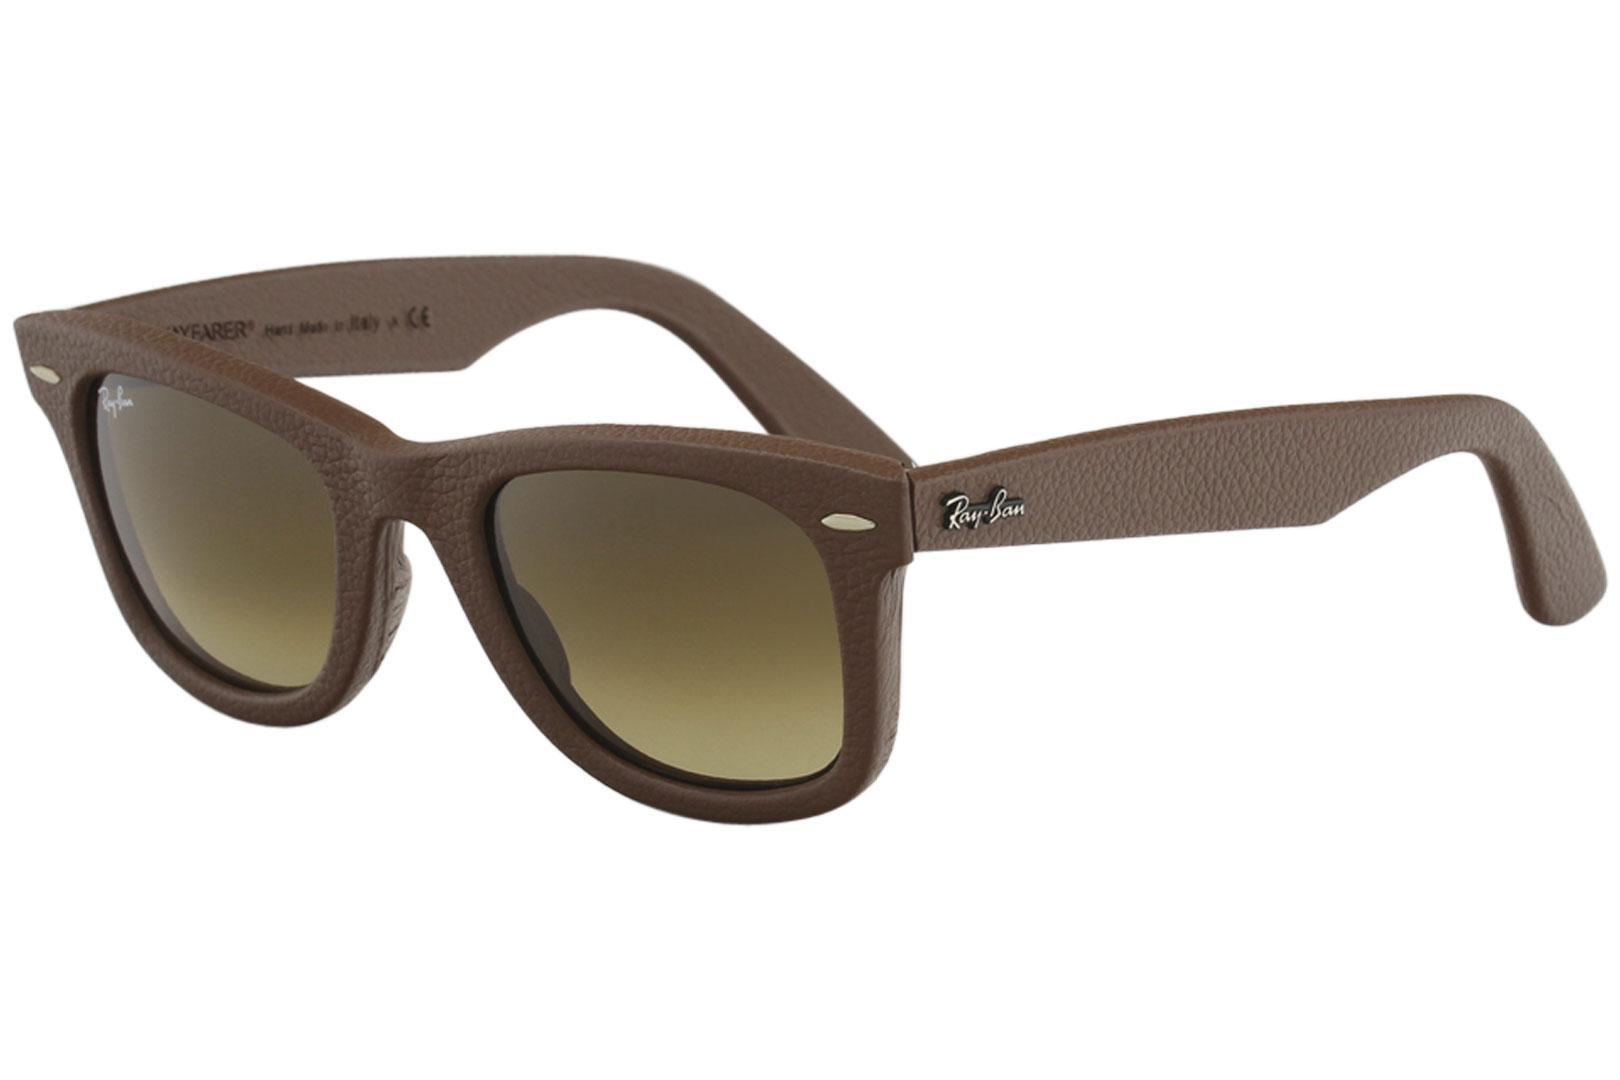 783c7273ff4c8c Ray Ban 2140QM 2140 QM RayBan Wayfarer Leather Sunglasses